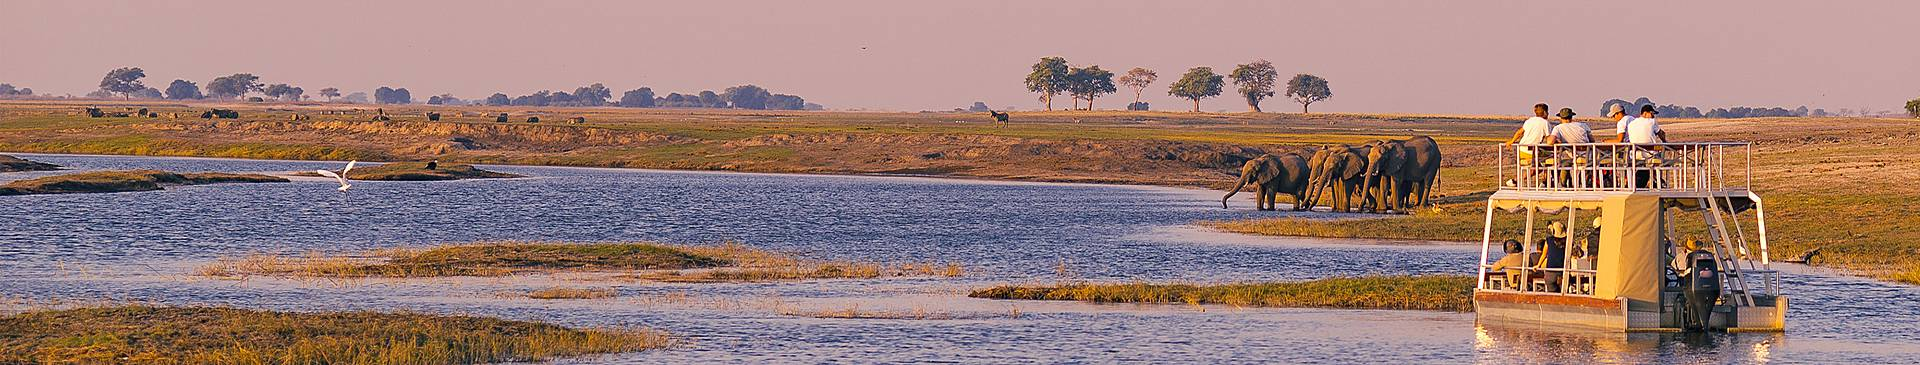 Botswana in March